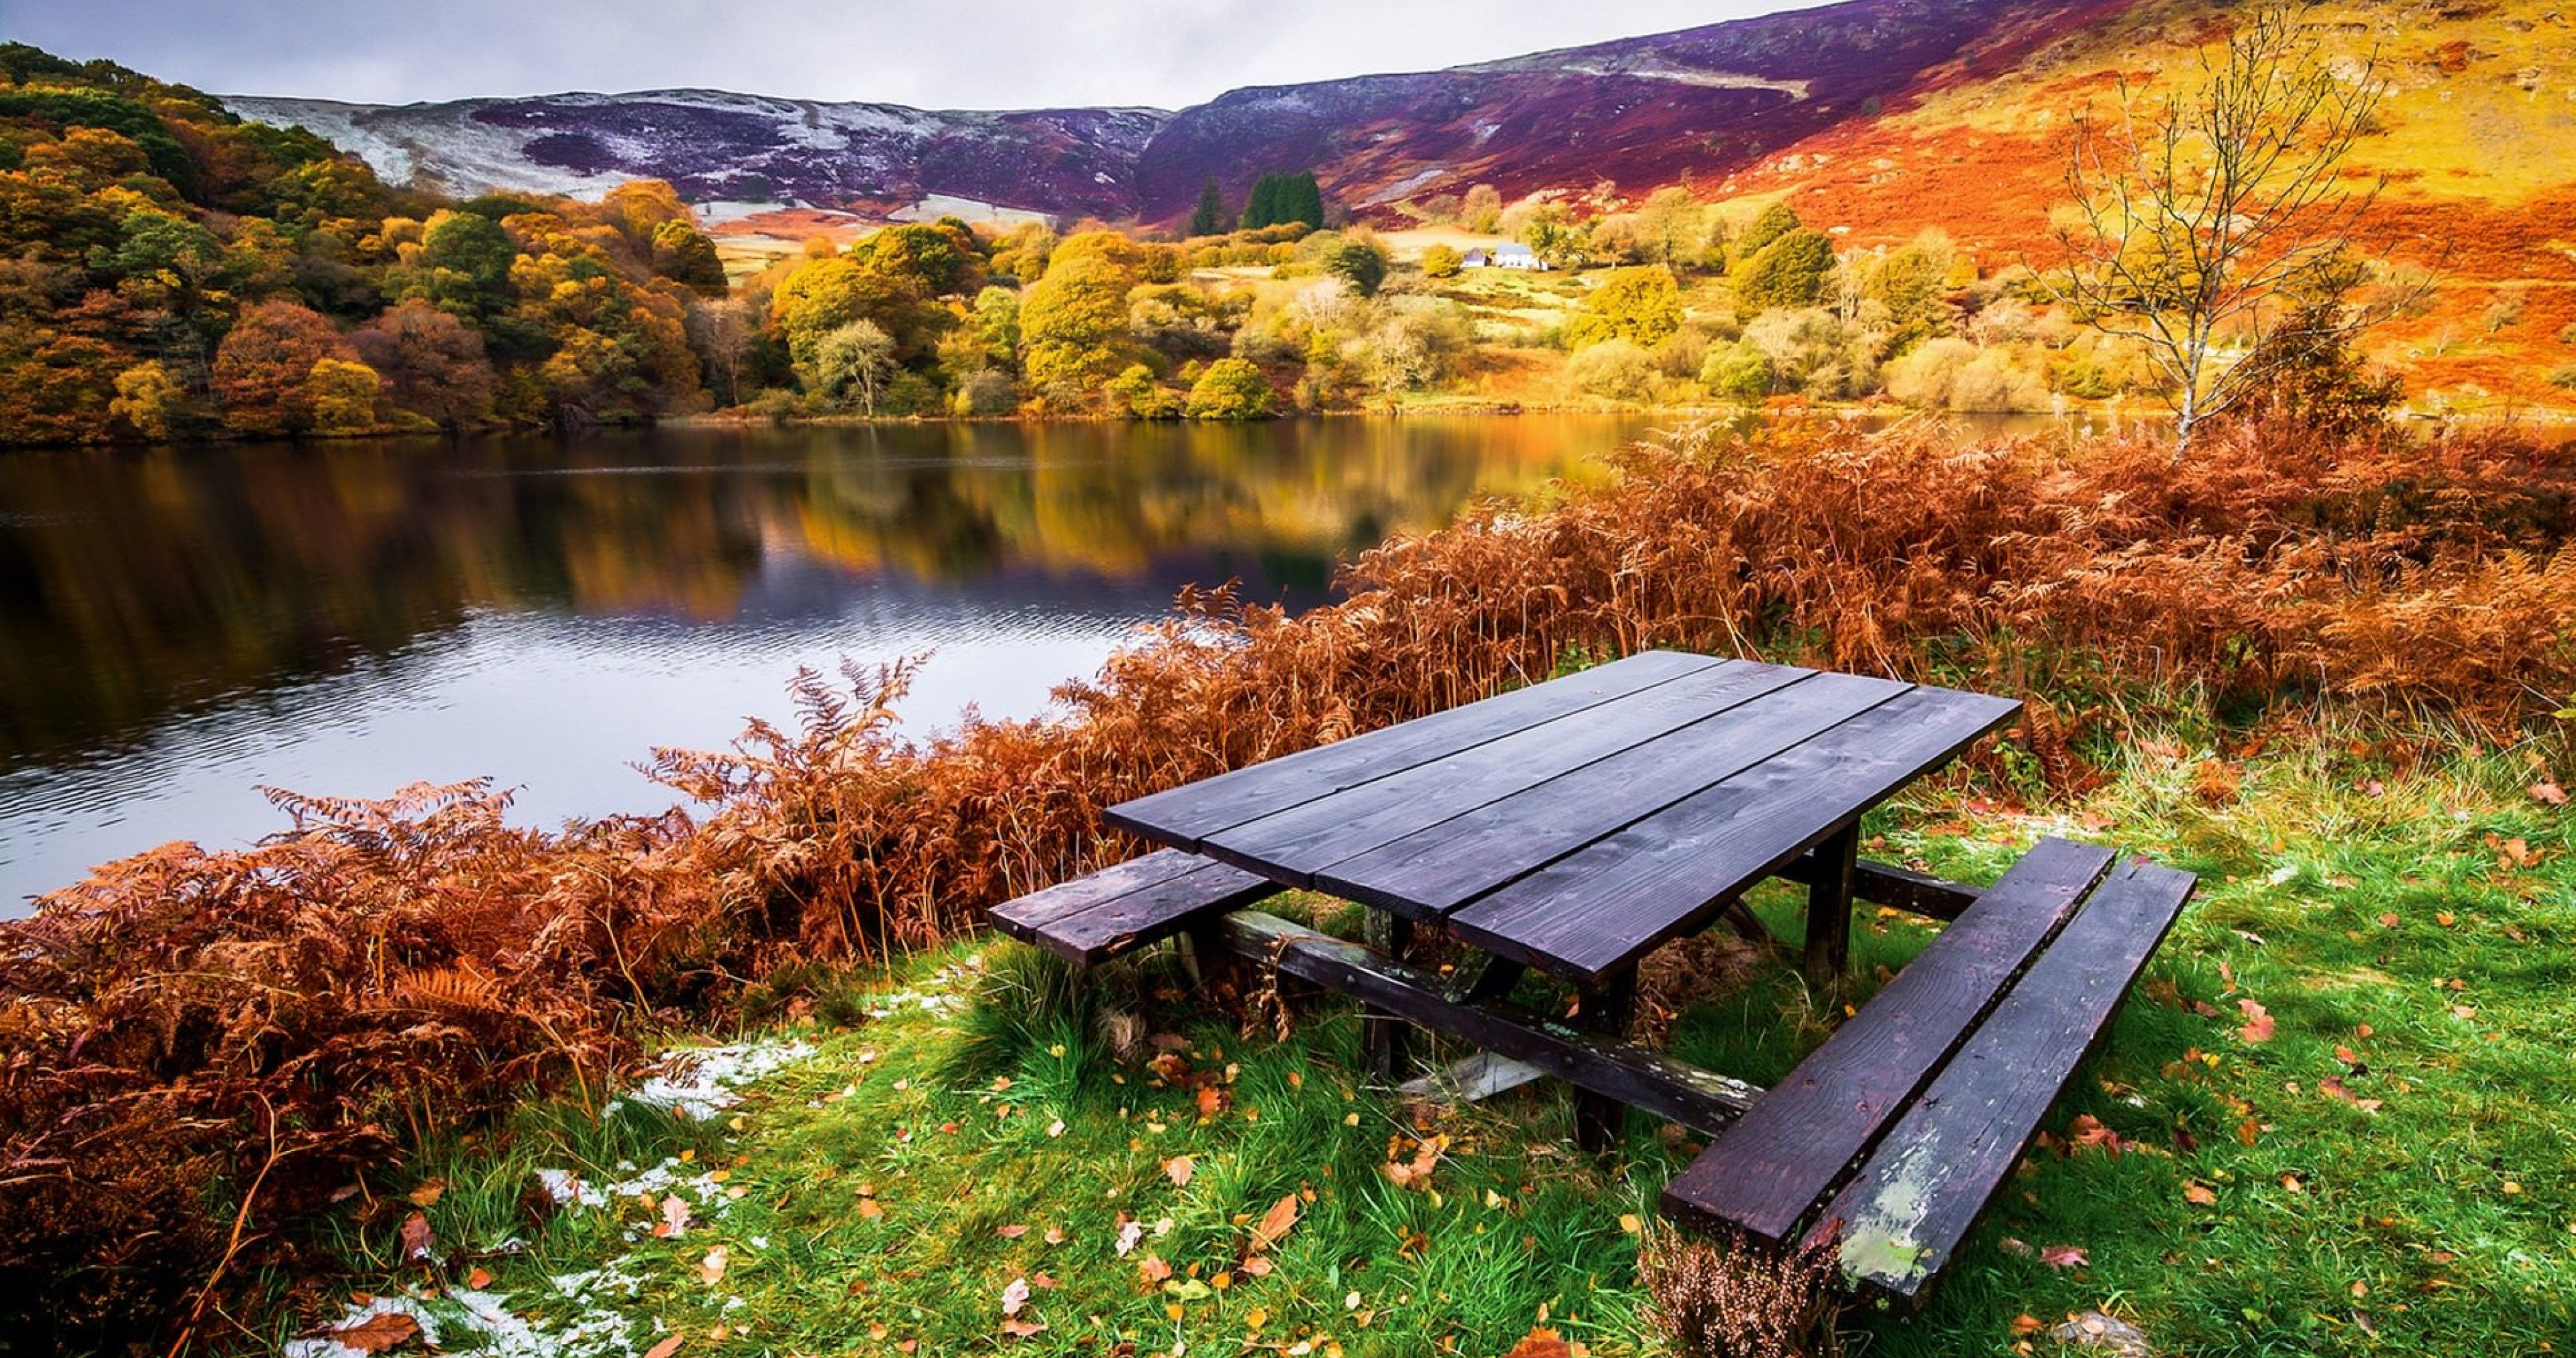 Table In Nature 4k Ultra Hd Wallpaper Landscape Wallpaper Picnic Bench Nature Wallpaper